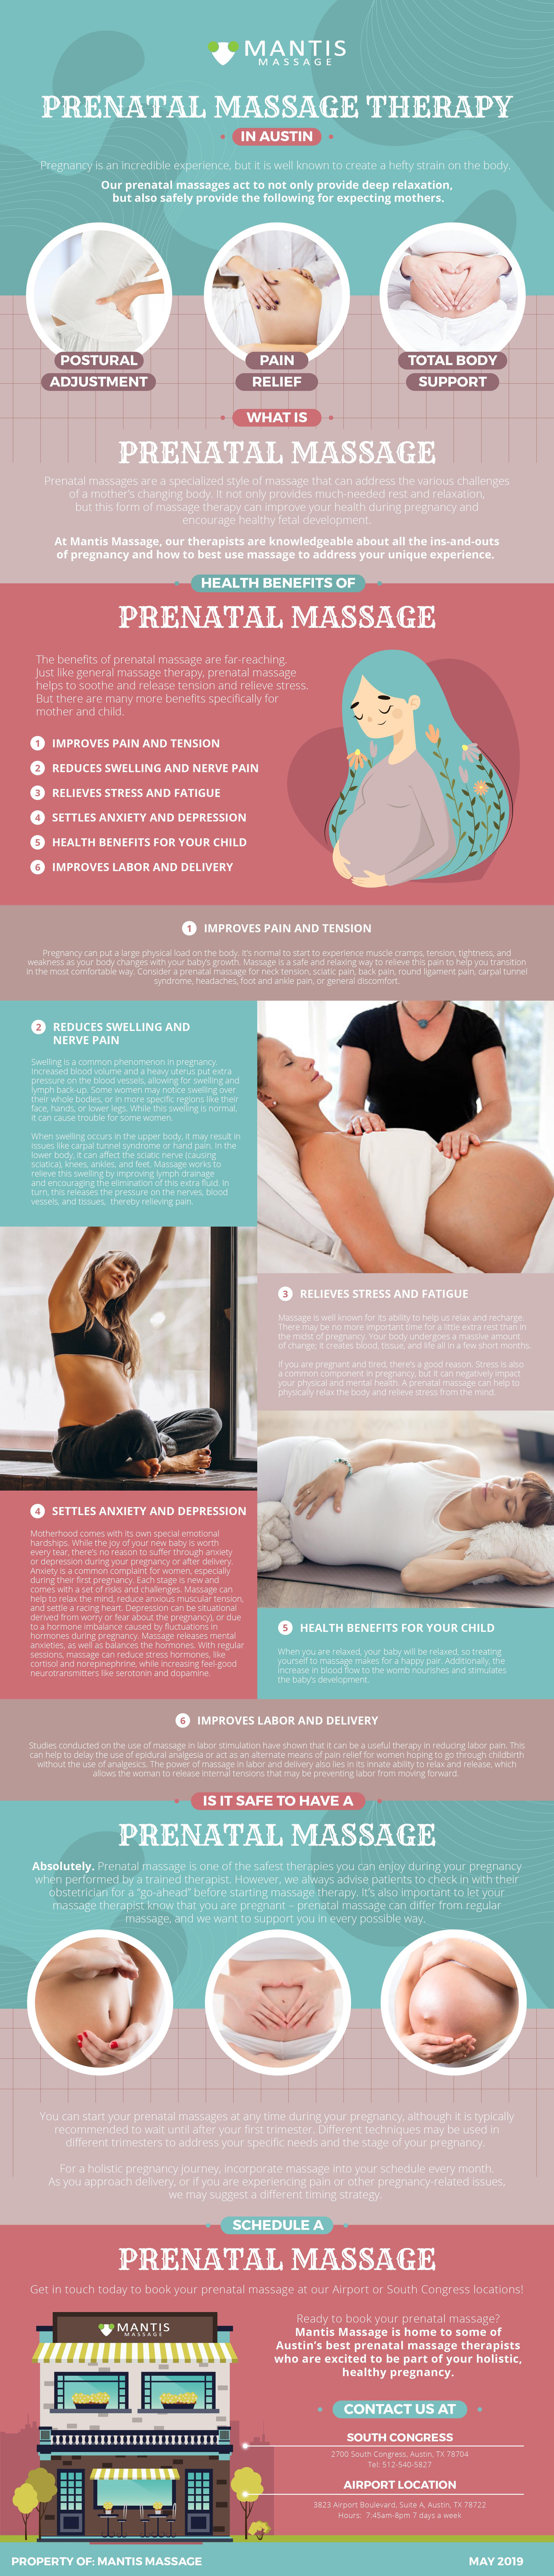 Mantis Massage - Prenatal Massage_Infographics-01 (1).png